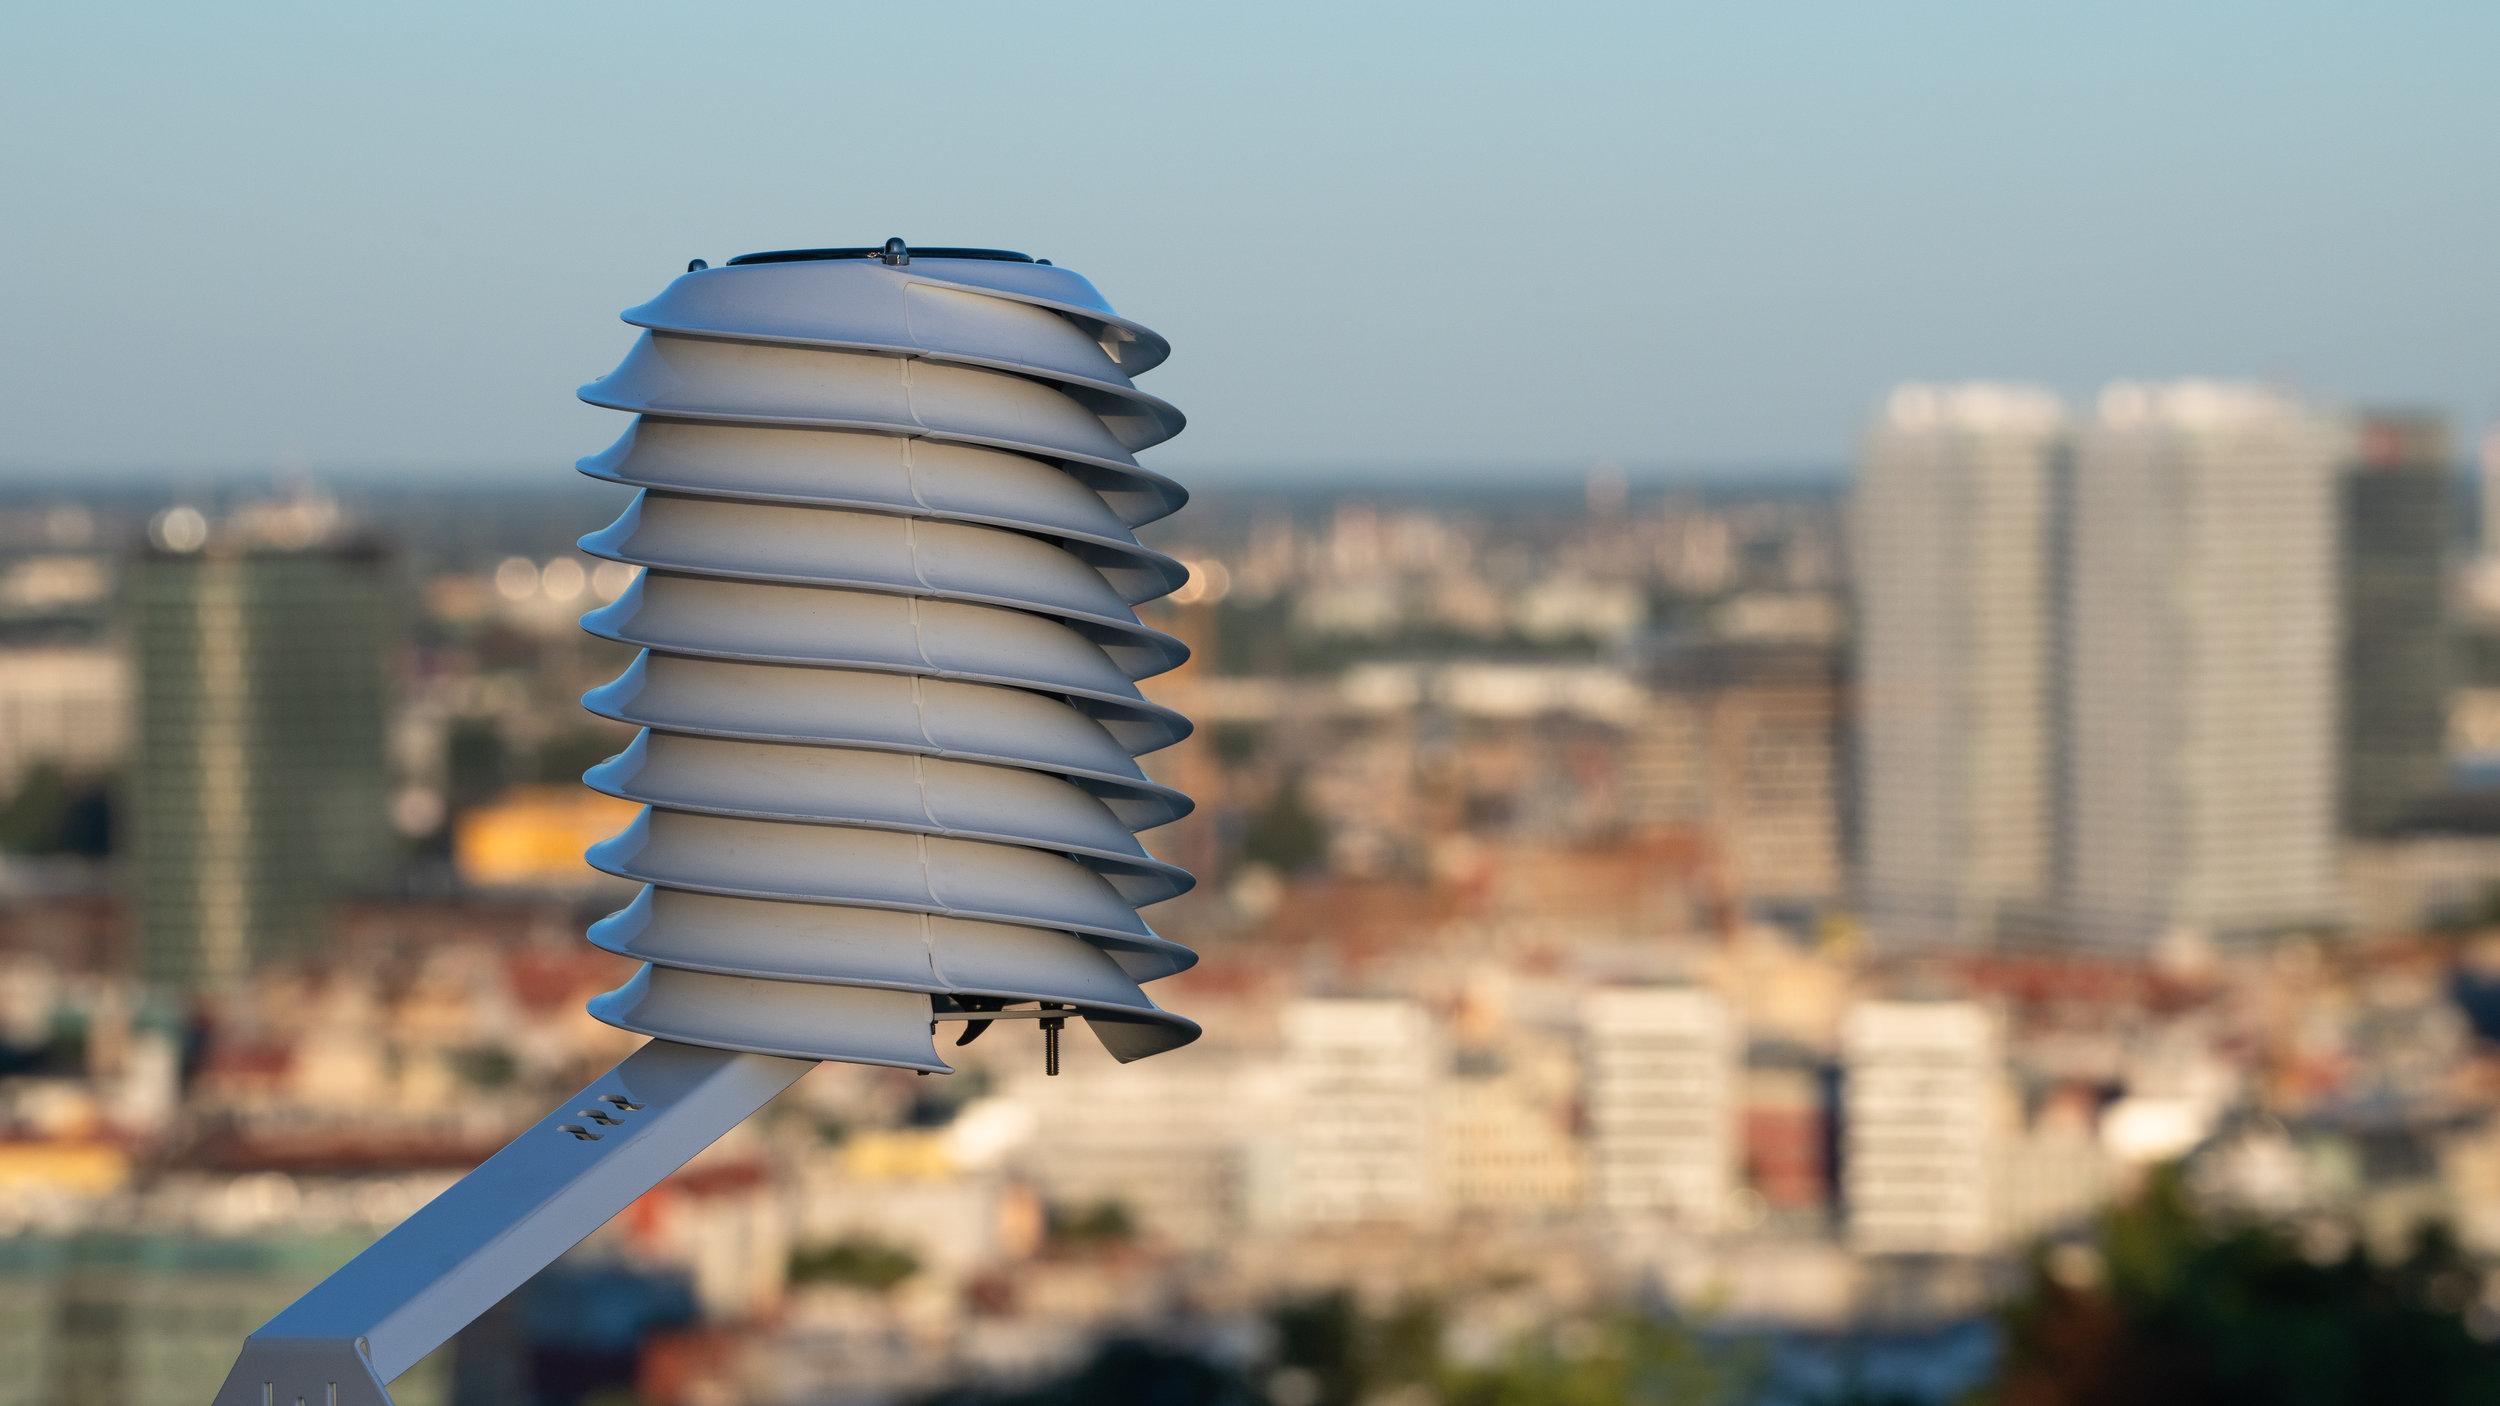 MeteoHelix IoT Pro overlooking a city skyline